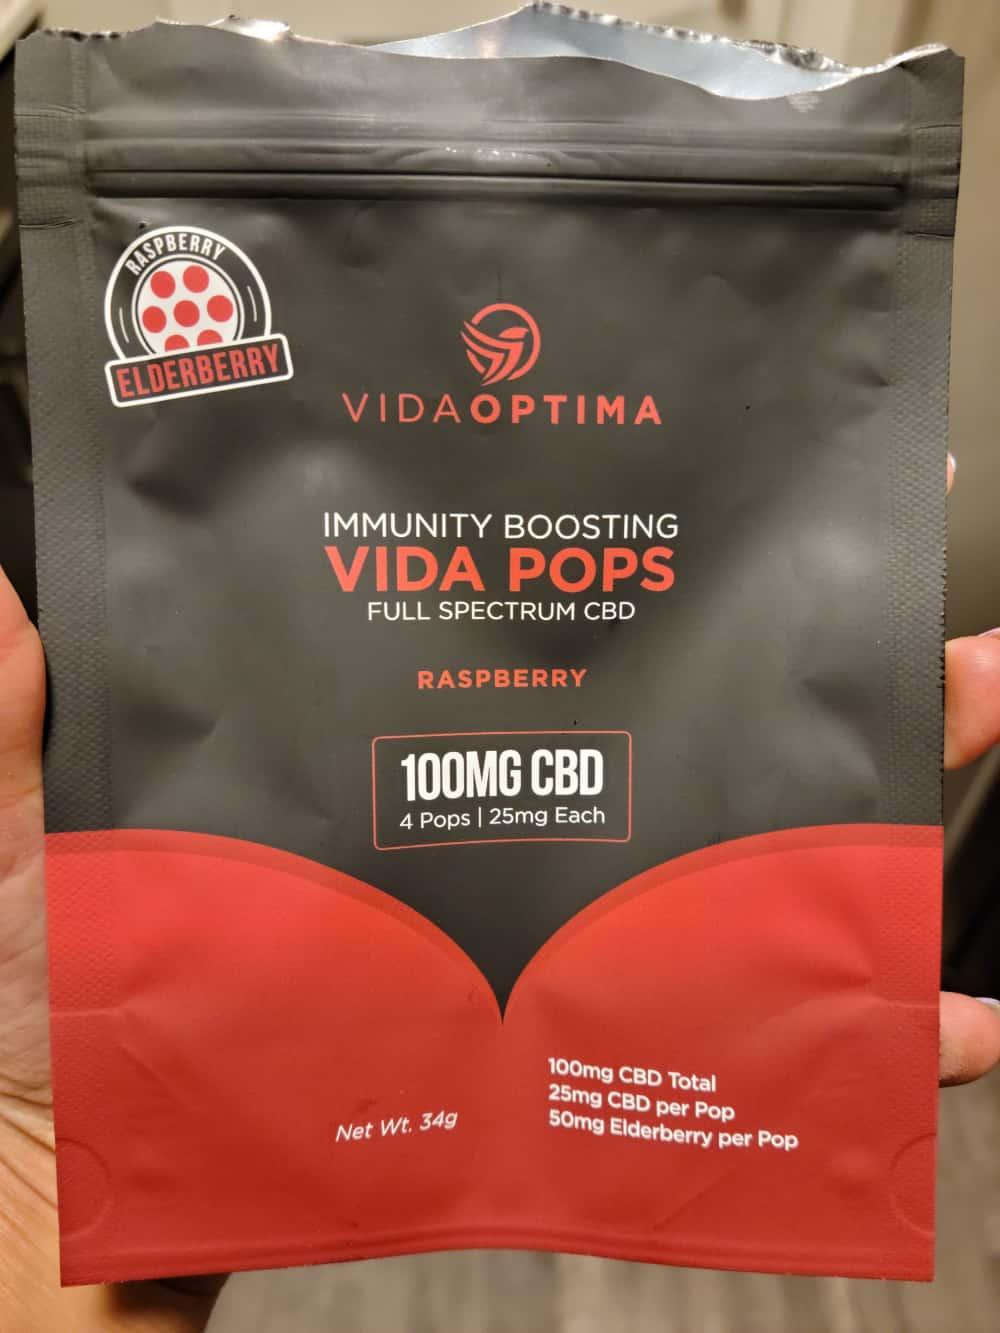 Vida Optima Immunity Boosting Vida Pops Raspberry Save On Cannabis Review Beauty Shot